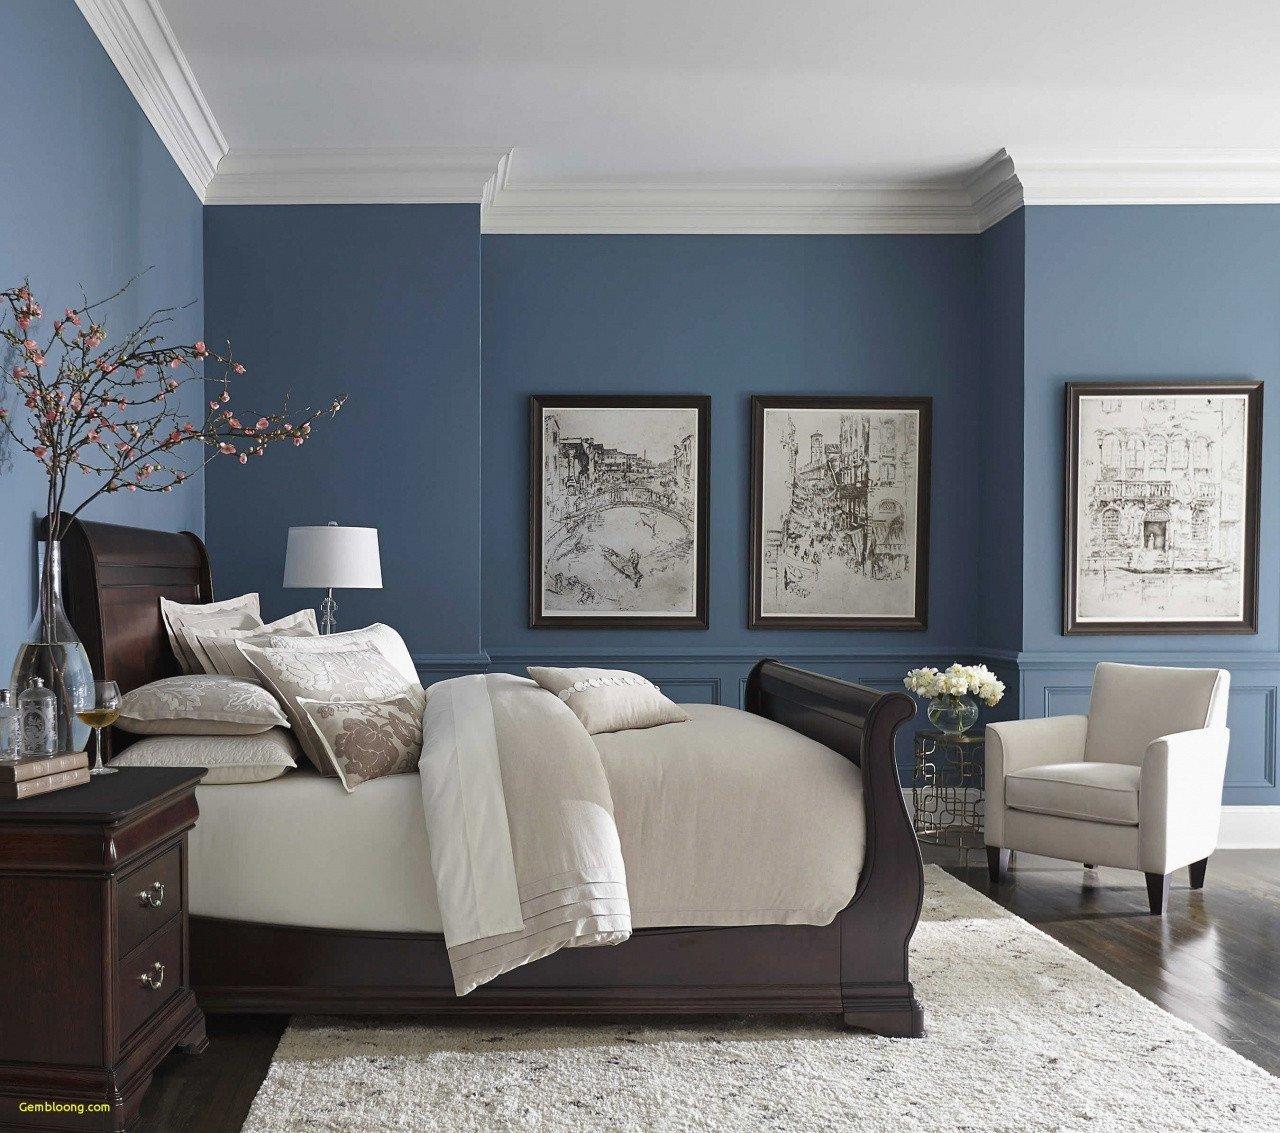 Teenage Girl Bedroom Ideas Inspirational Bedroom Decor for Teenage Girl – Bunk Bed Ideas